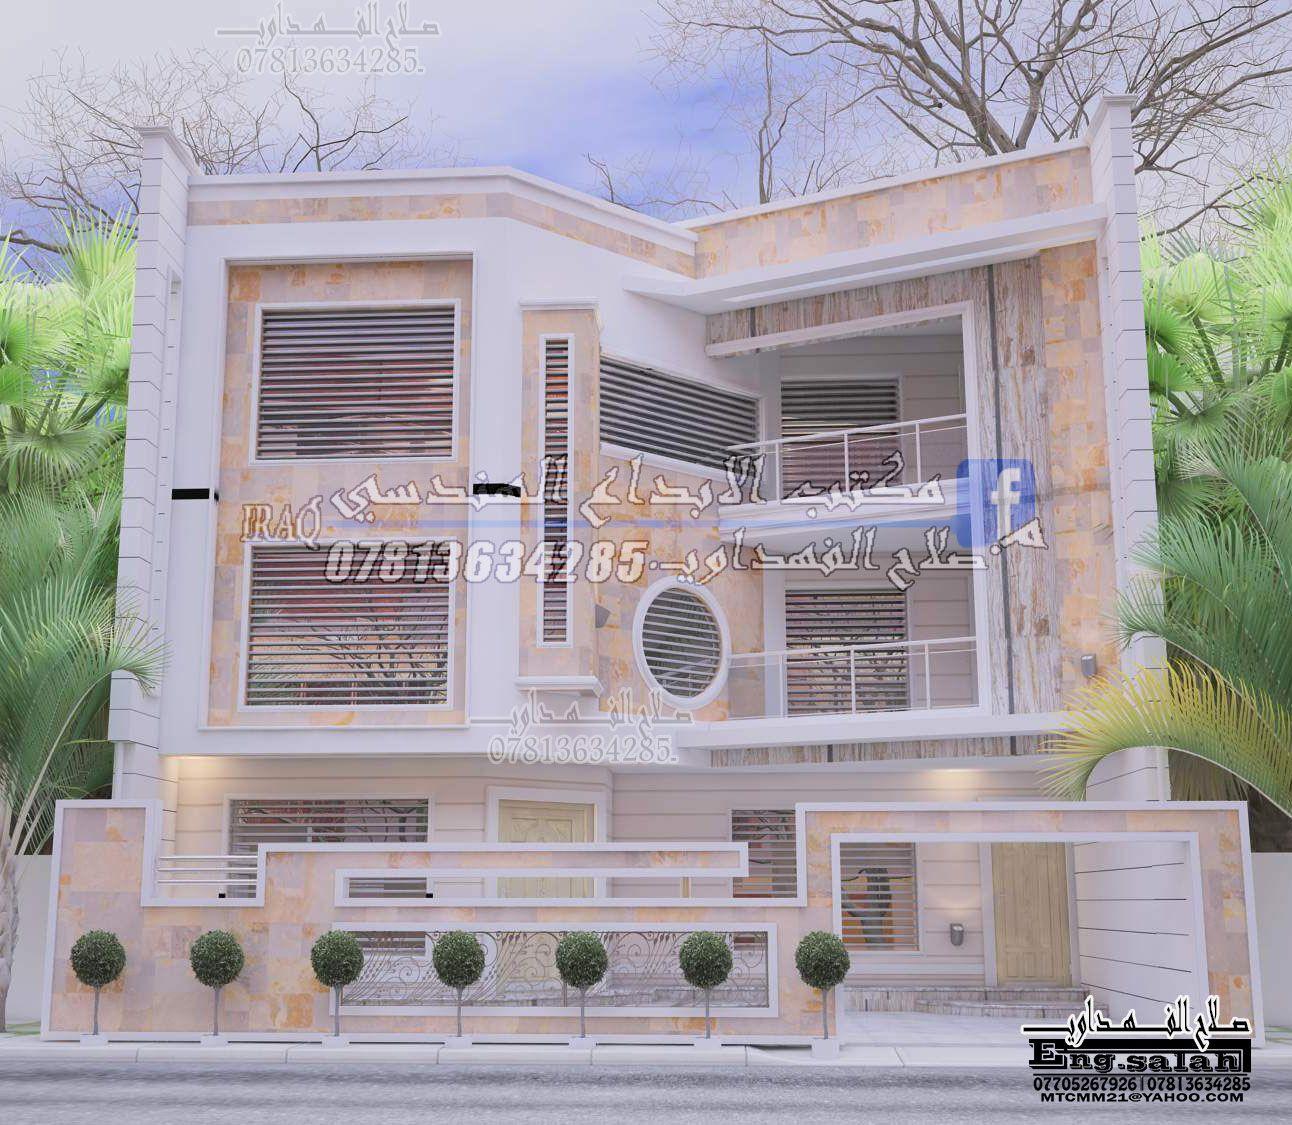 Indian Home Exterior Design Photos: Pin By صﻻح اﻻنباري On واجهات منازل عراقية